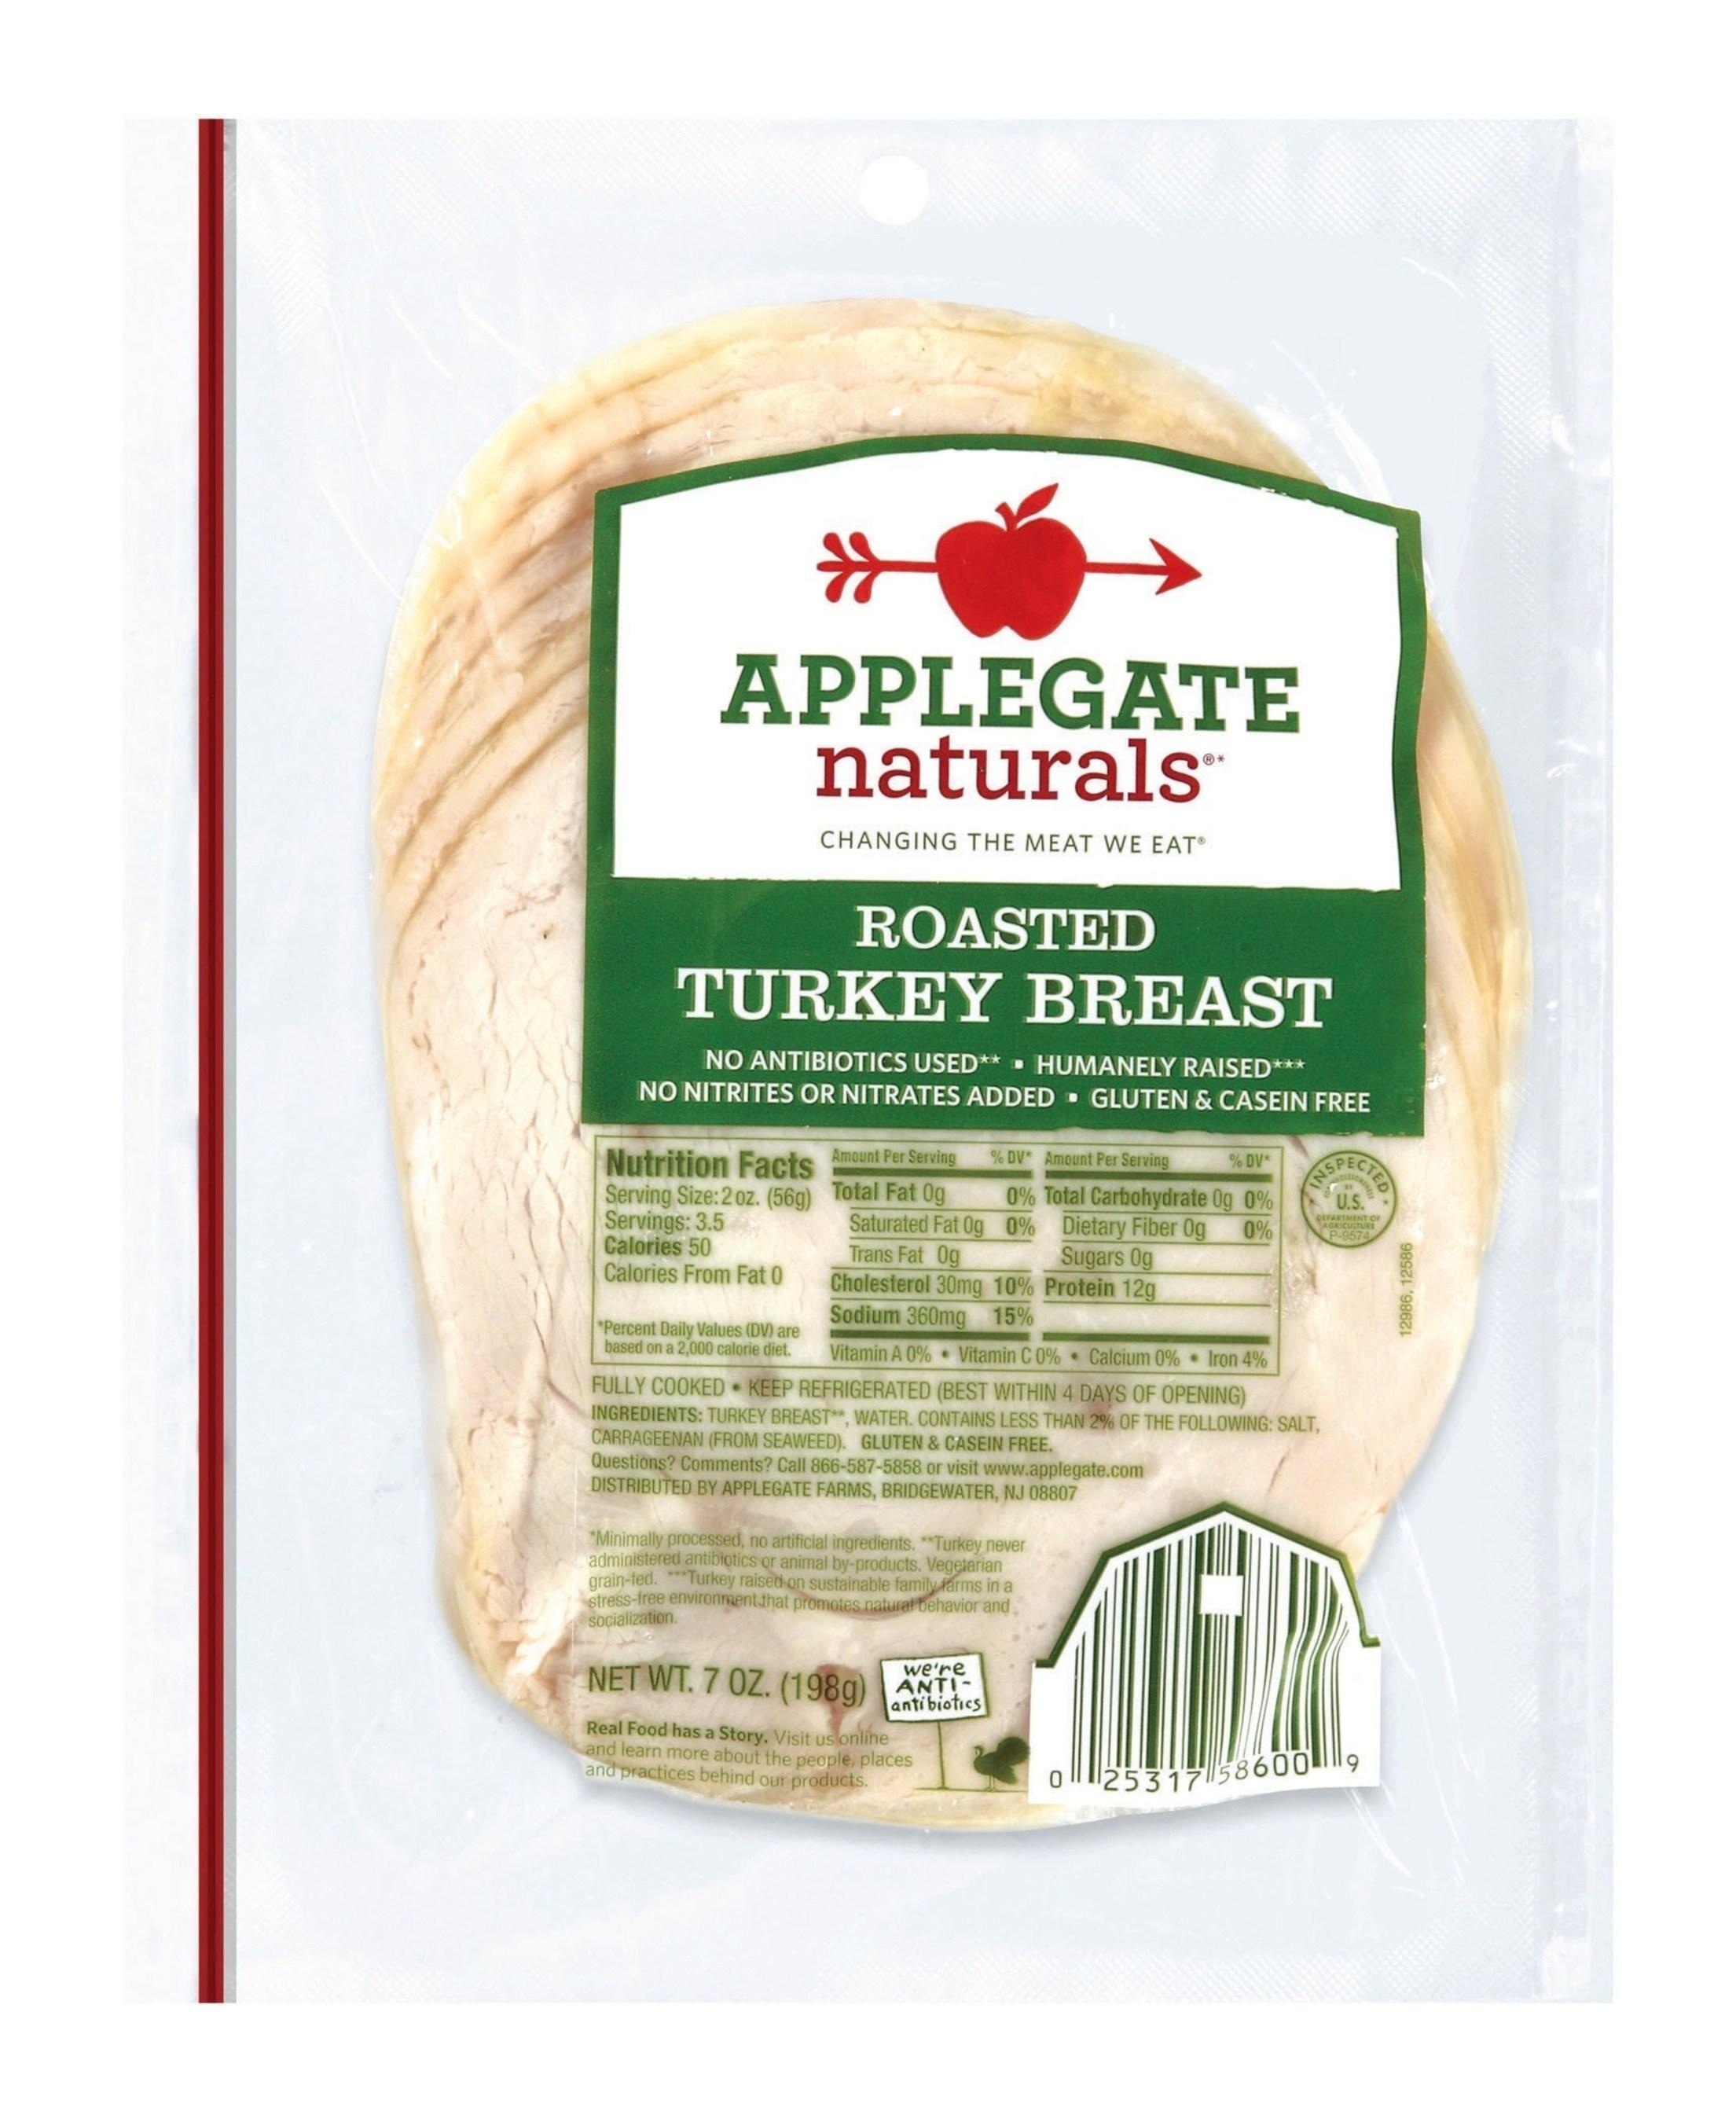 Applegate(R) Naturals Roasted Turkey Breast